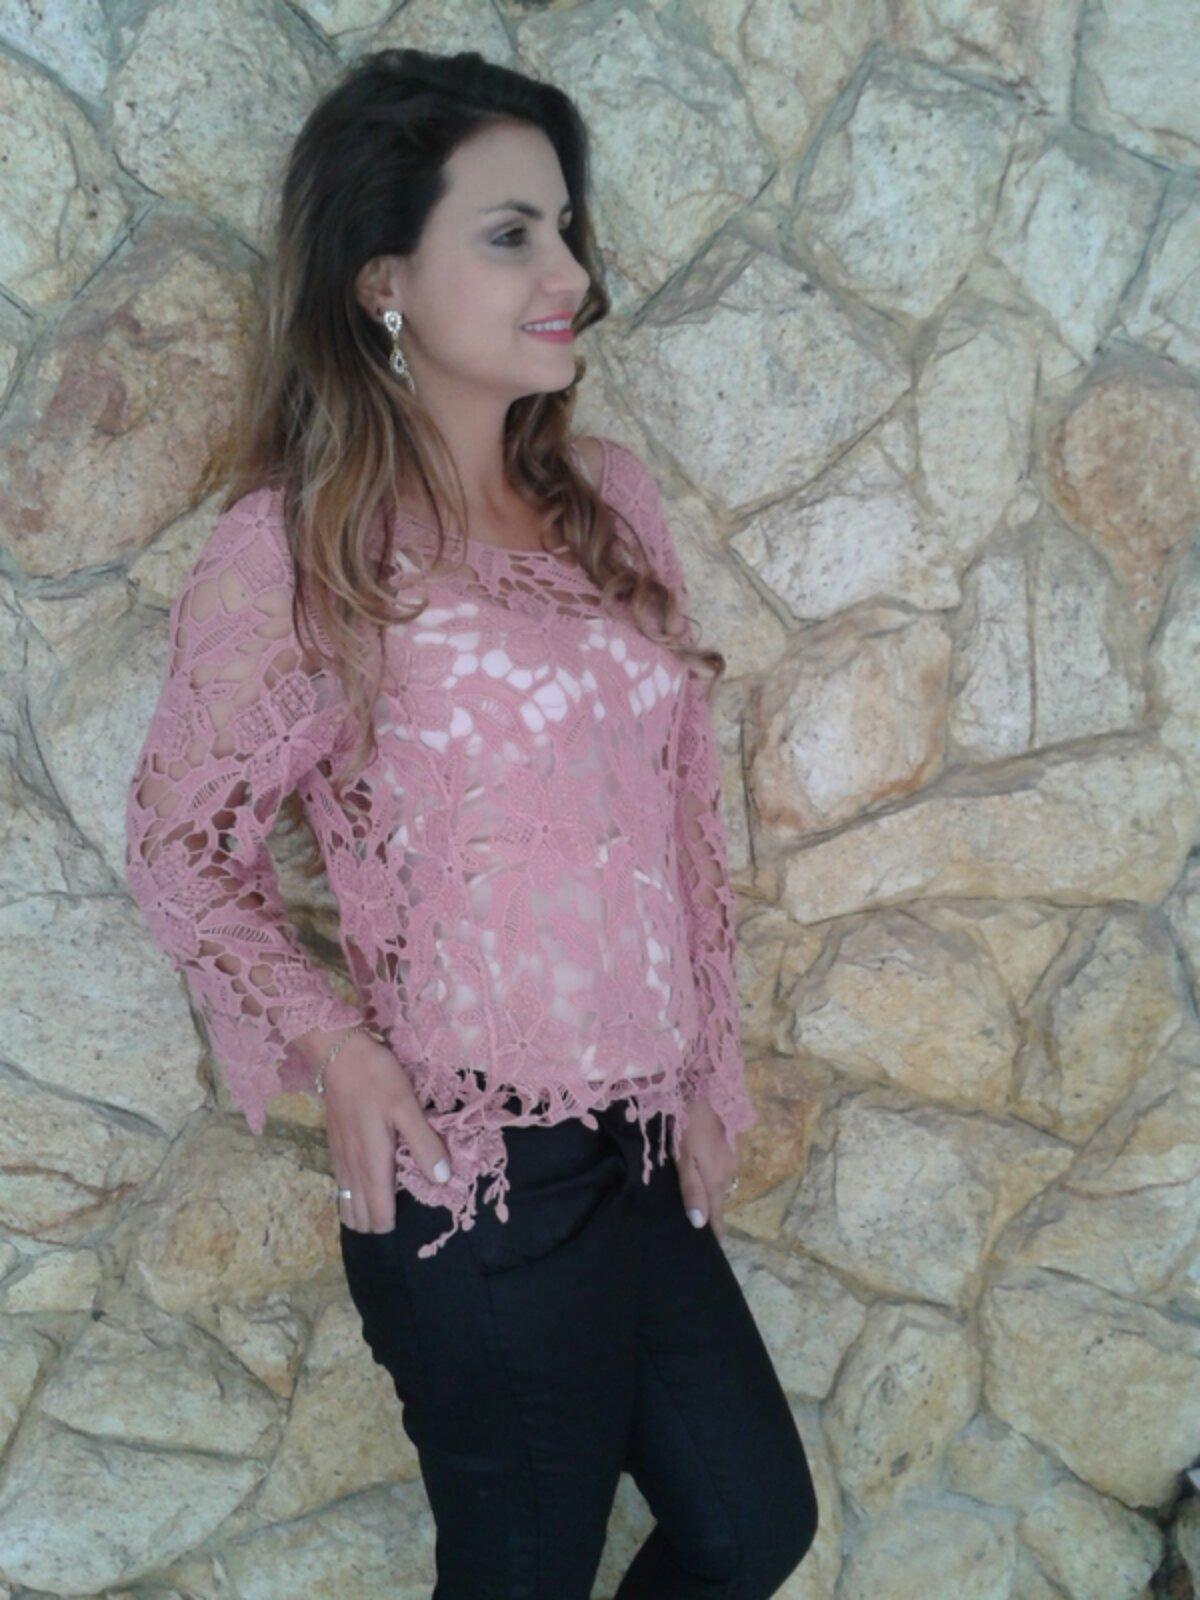 wpid-20131124_150329 Look de domingo blusa de renda + calca resignada